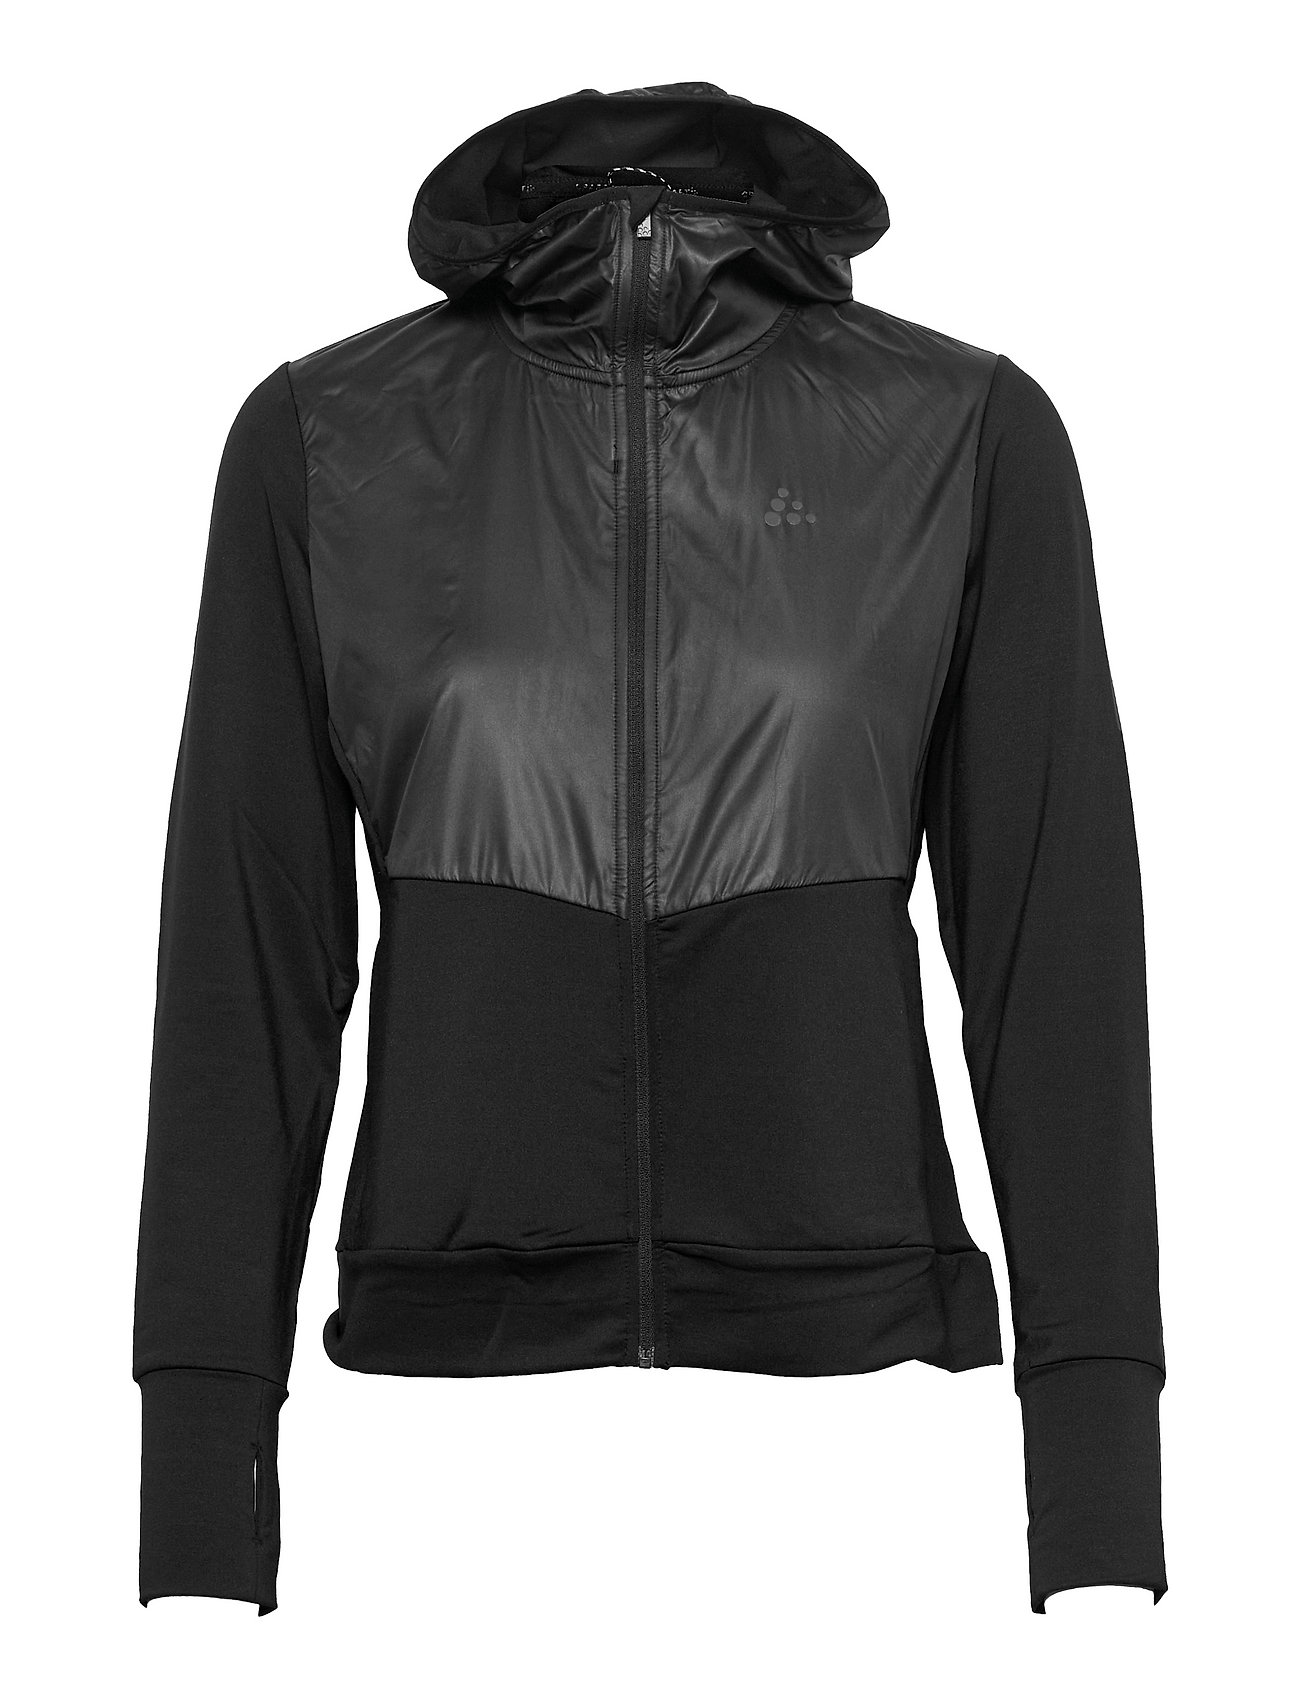 Adv Charge Jersey Hood Jacket W Outerwear Sport Jackets Sort Craft